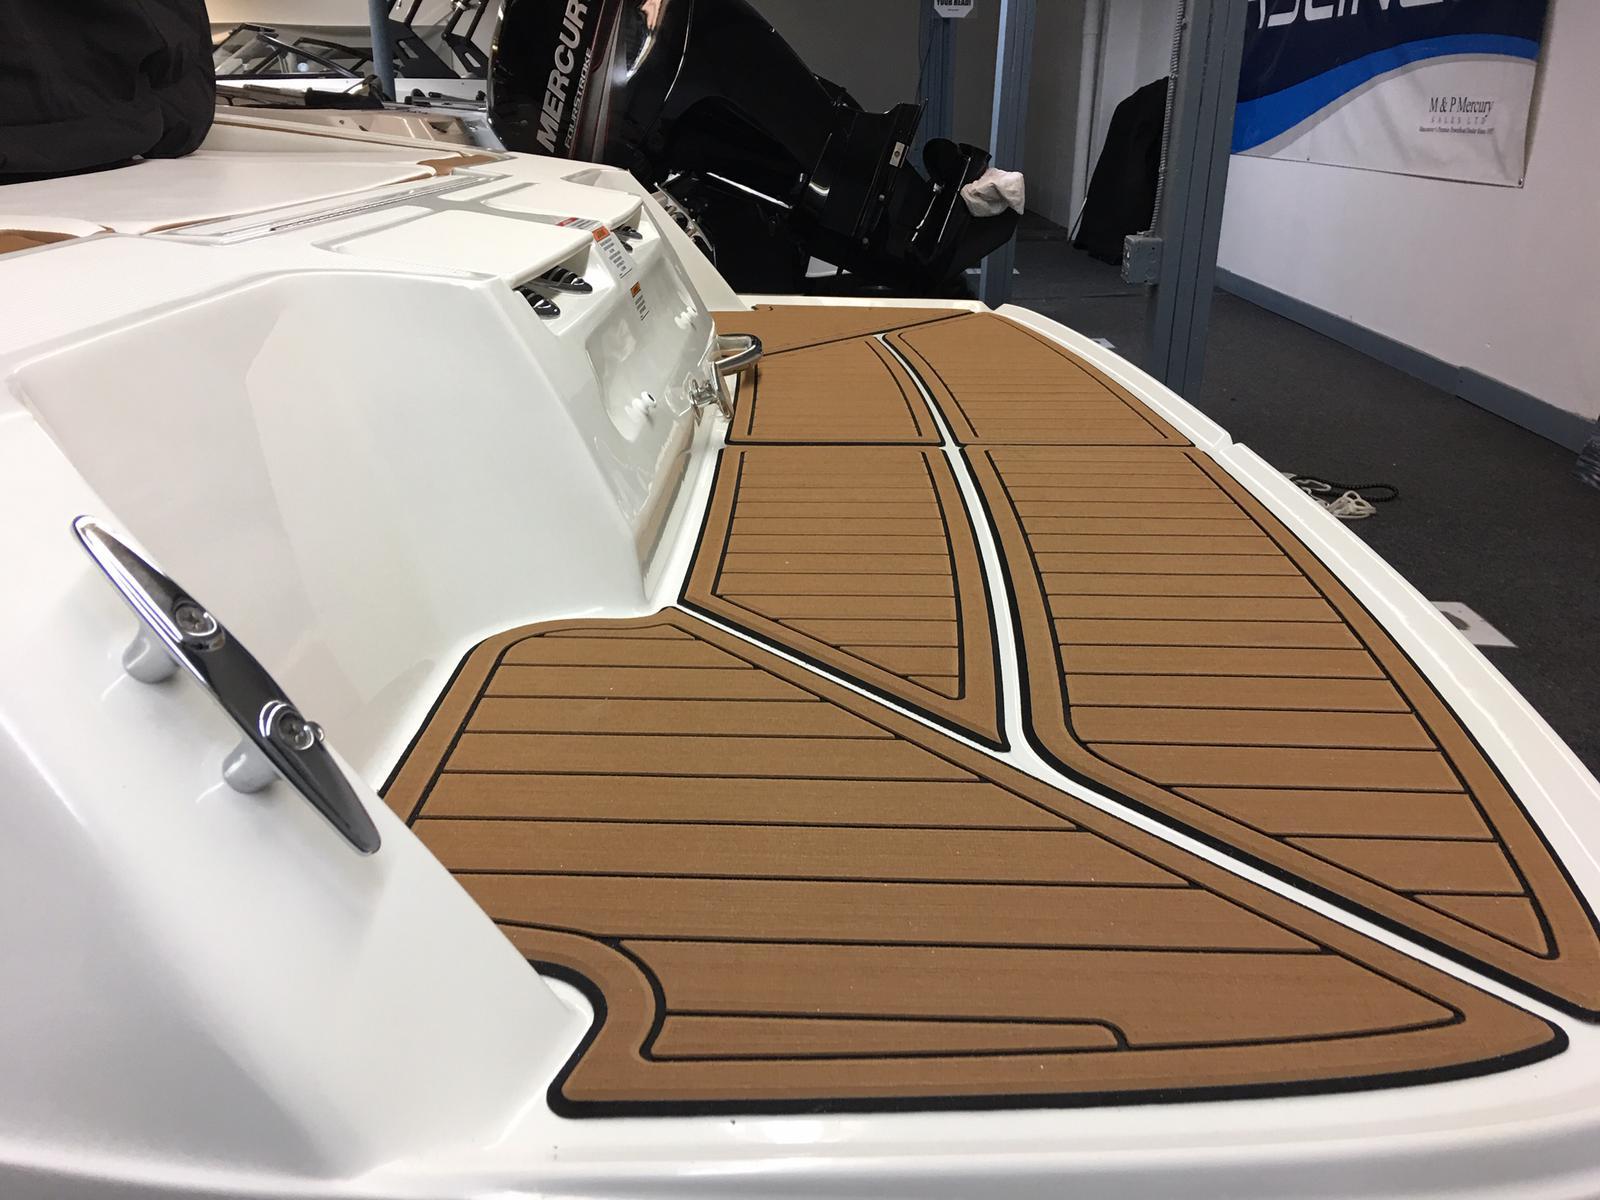 2019 Bayliner boat for sale, model of the boat is VR4 Bowrider & Image # 5 of 23